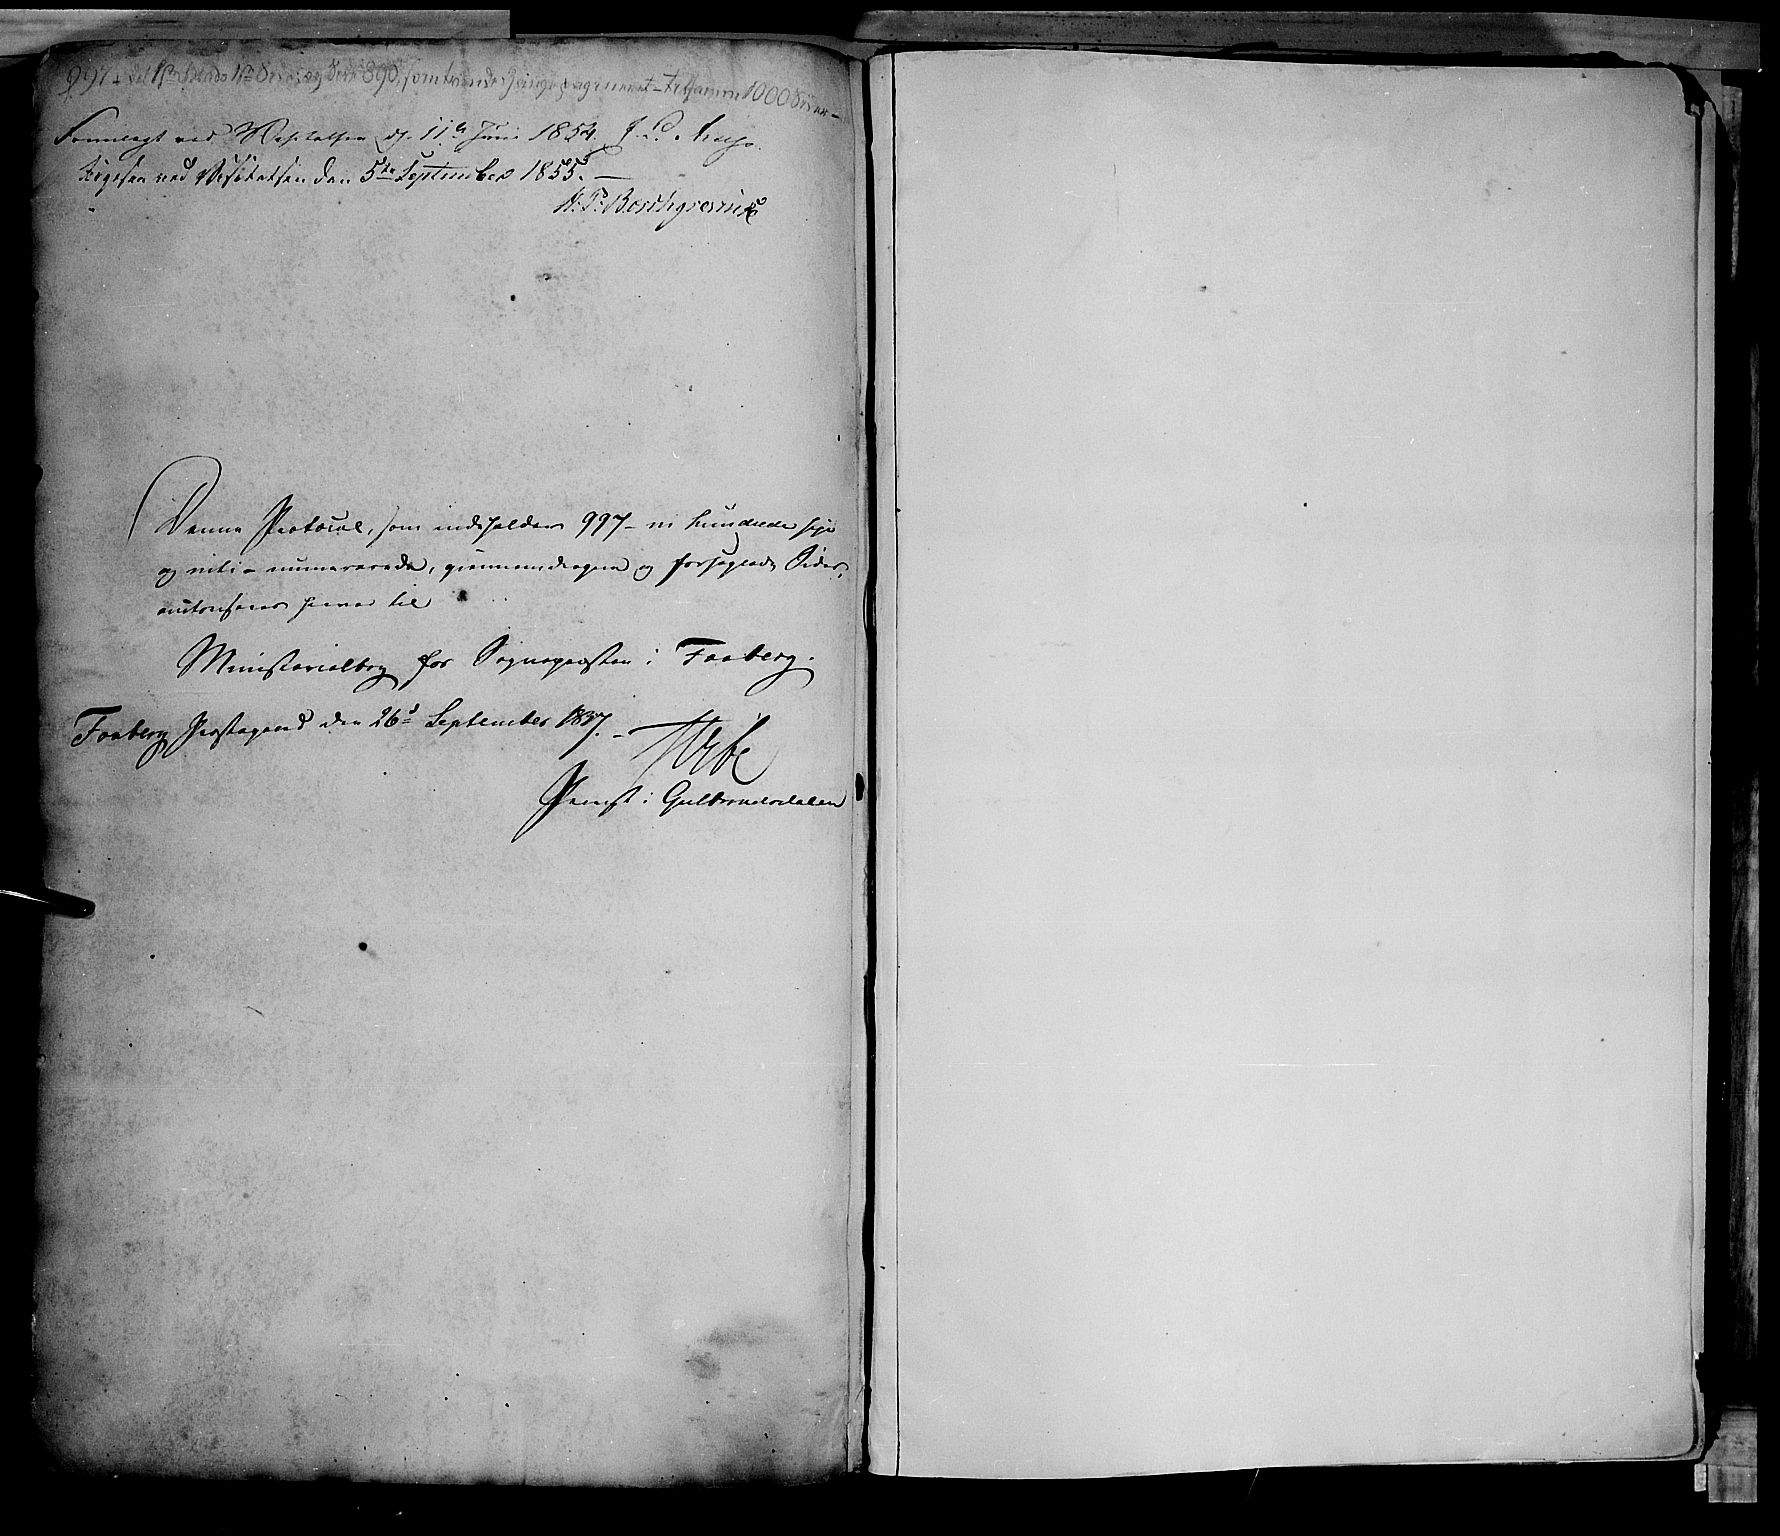 SAH, Fåberg prestekontor, Ministerialbok nr. 5, 1836-1854, s. 991-992